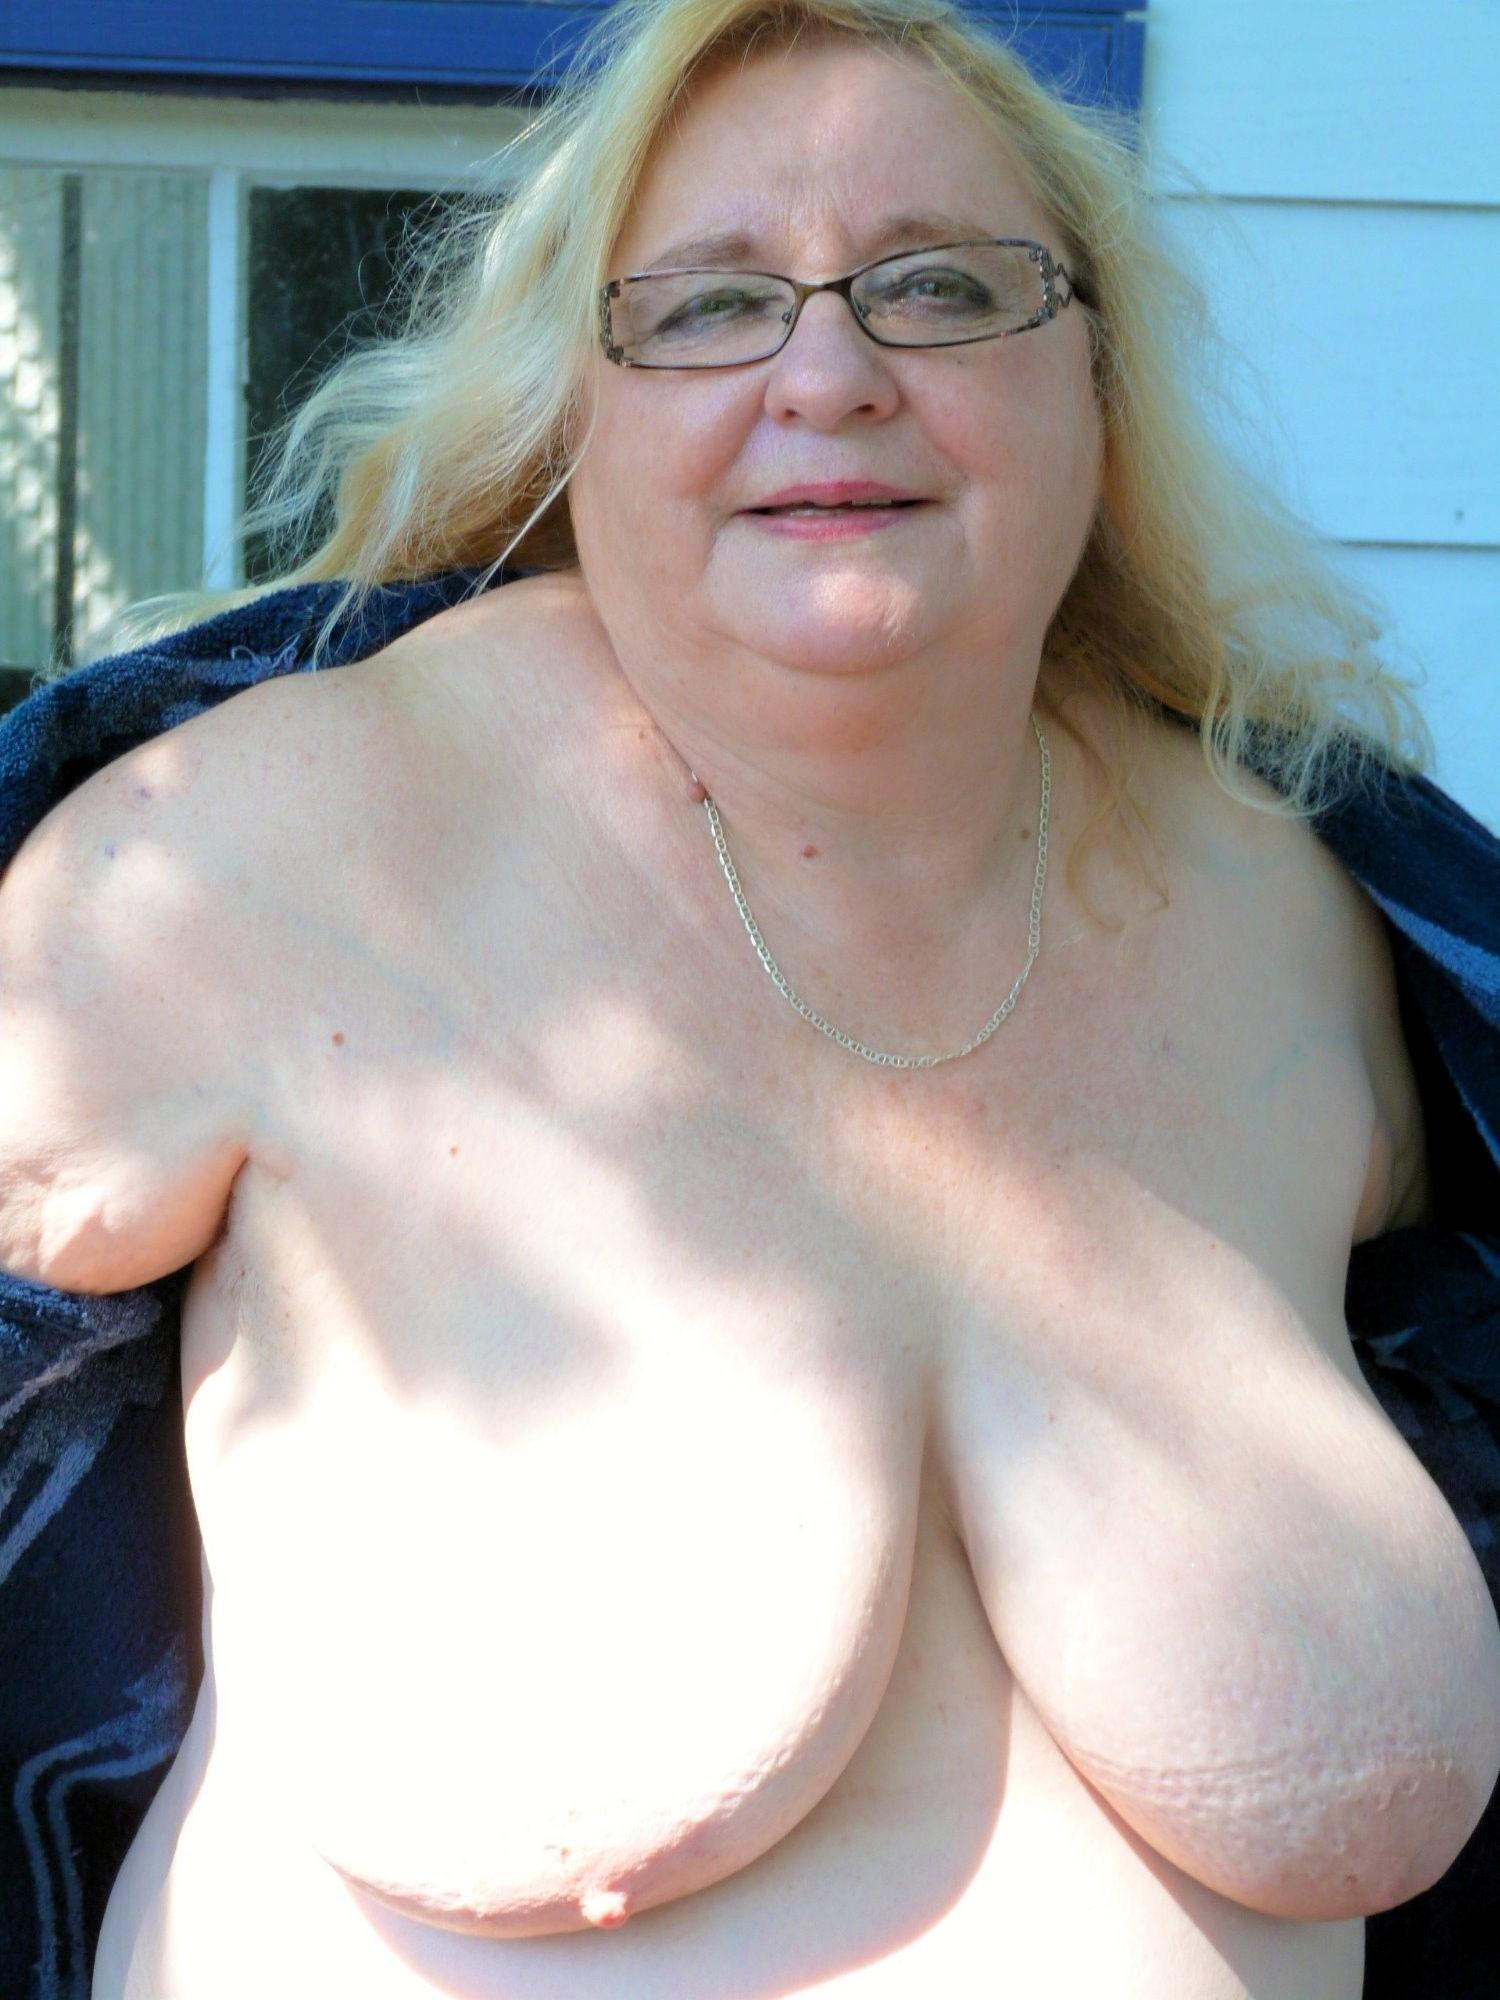 Selina gomez look alike porn